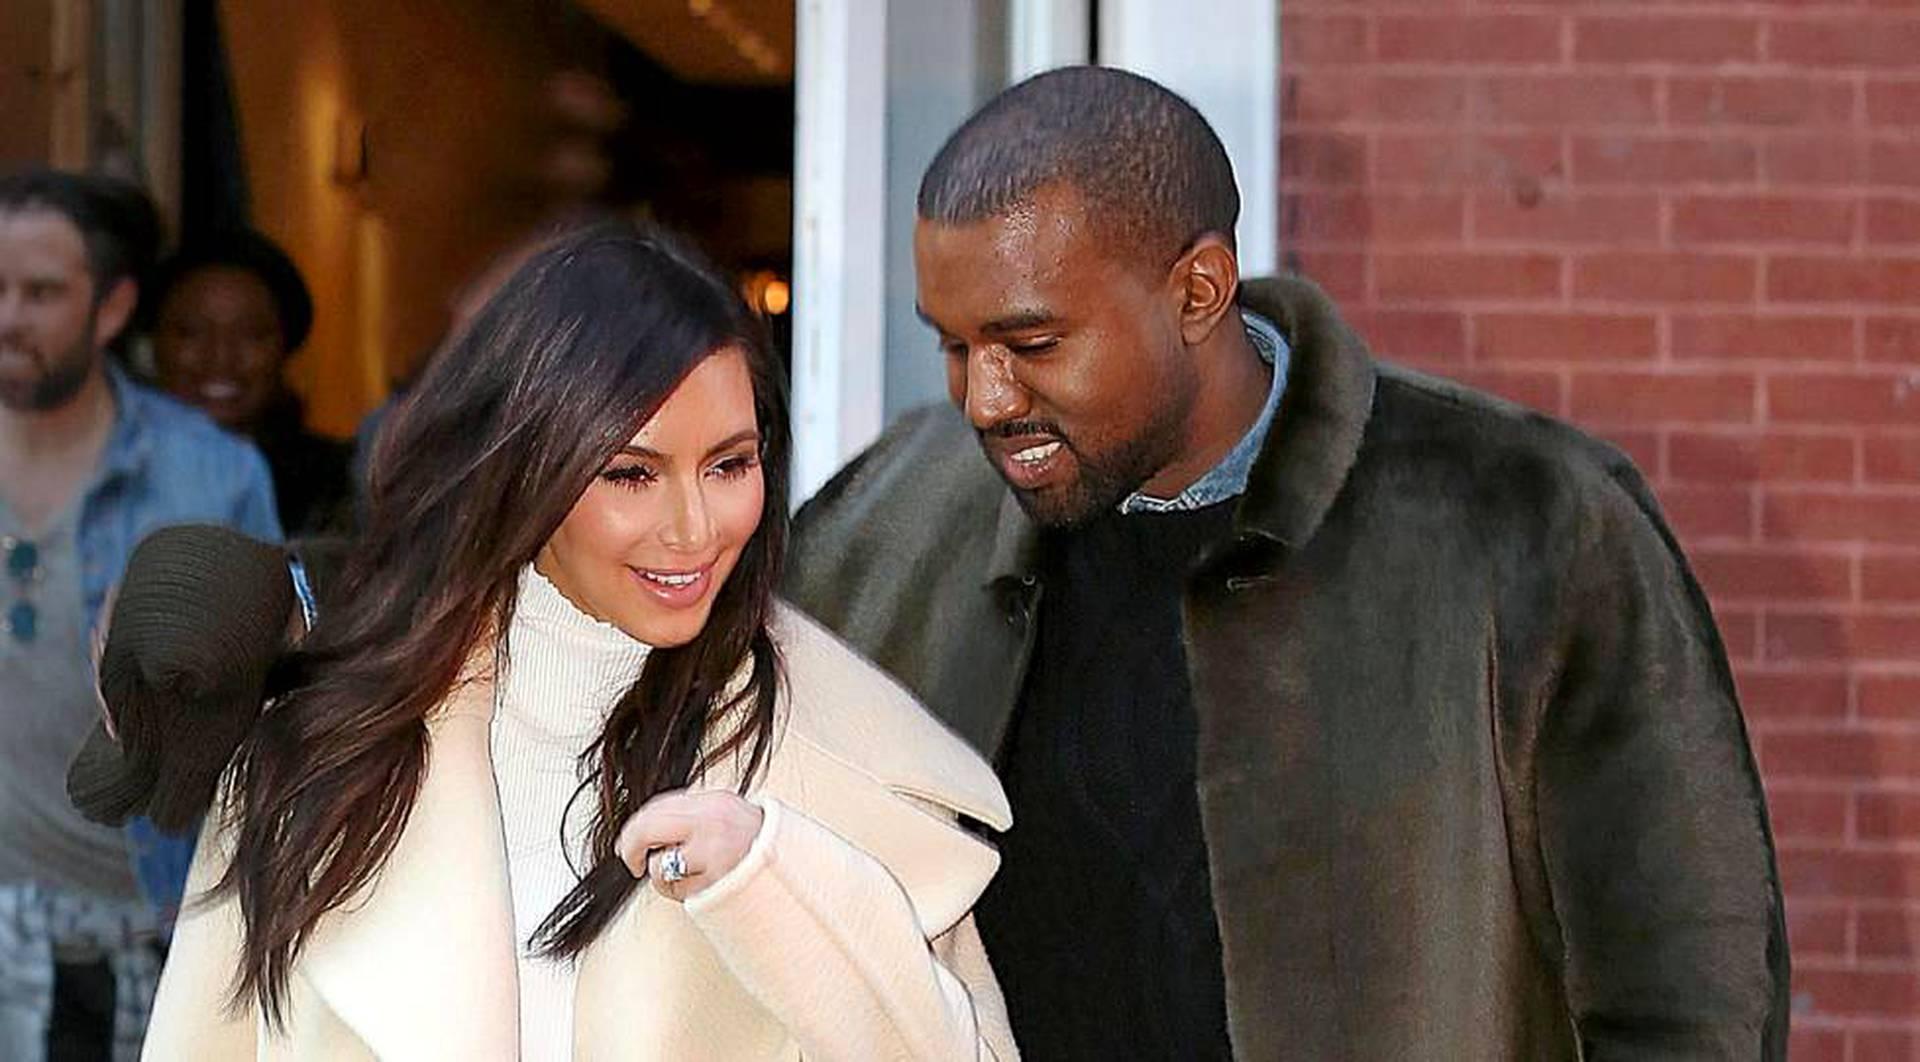 Kardashians dating räppärit